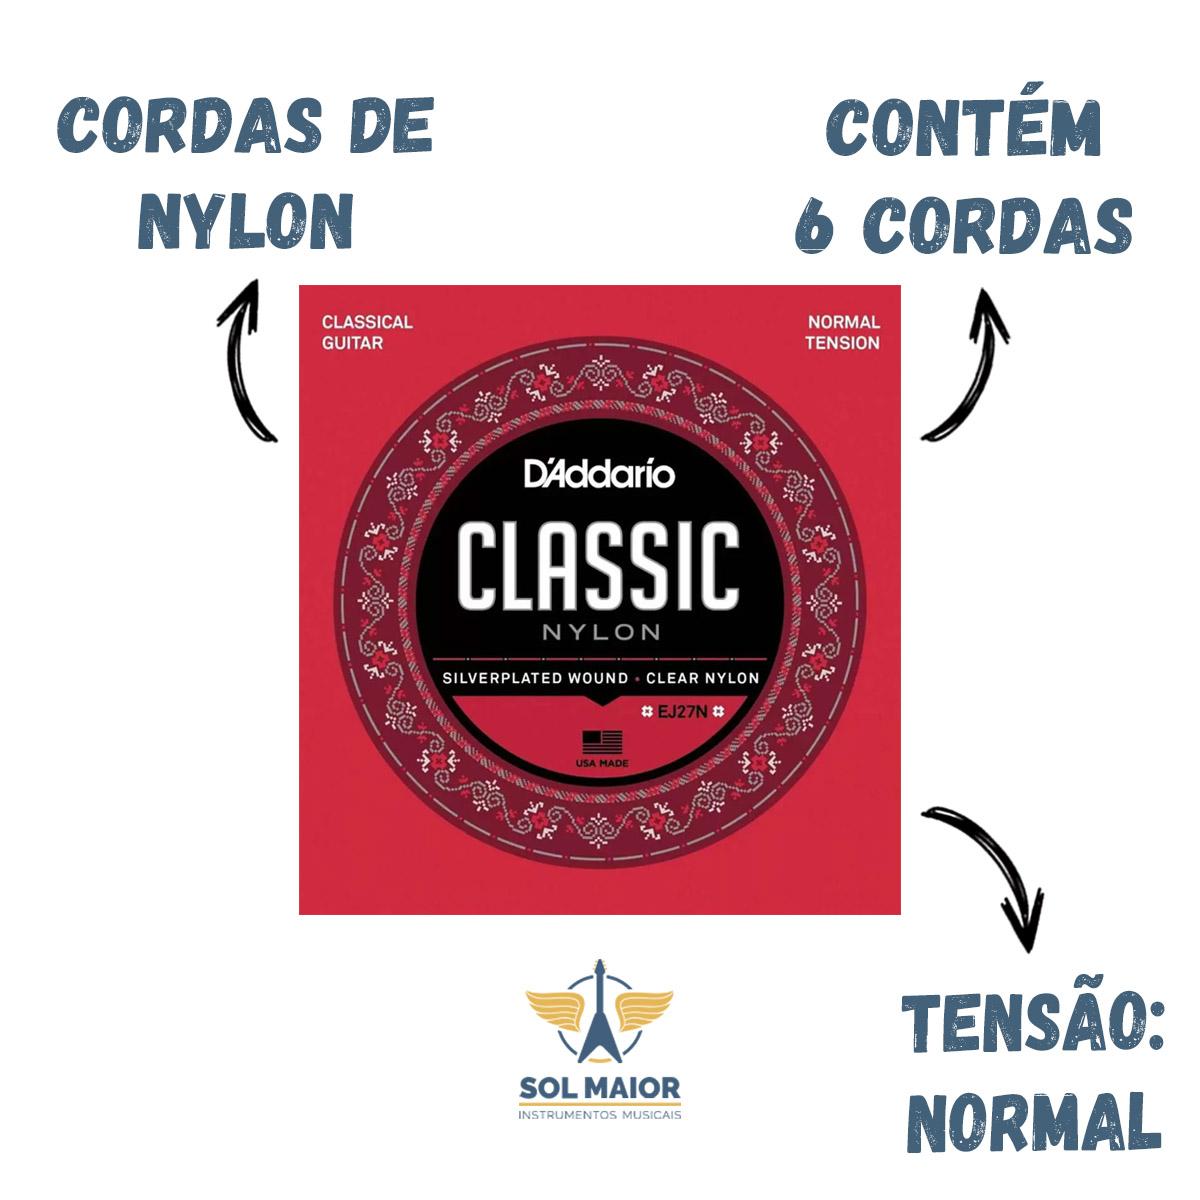 Encordoamento Daddario Violão Nylon Ej27n D'addario Ej27